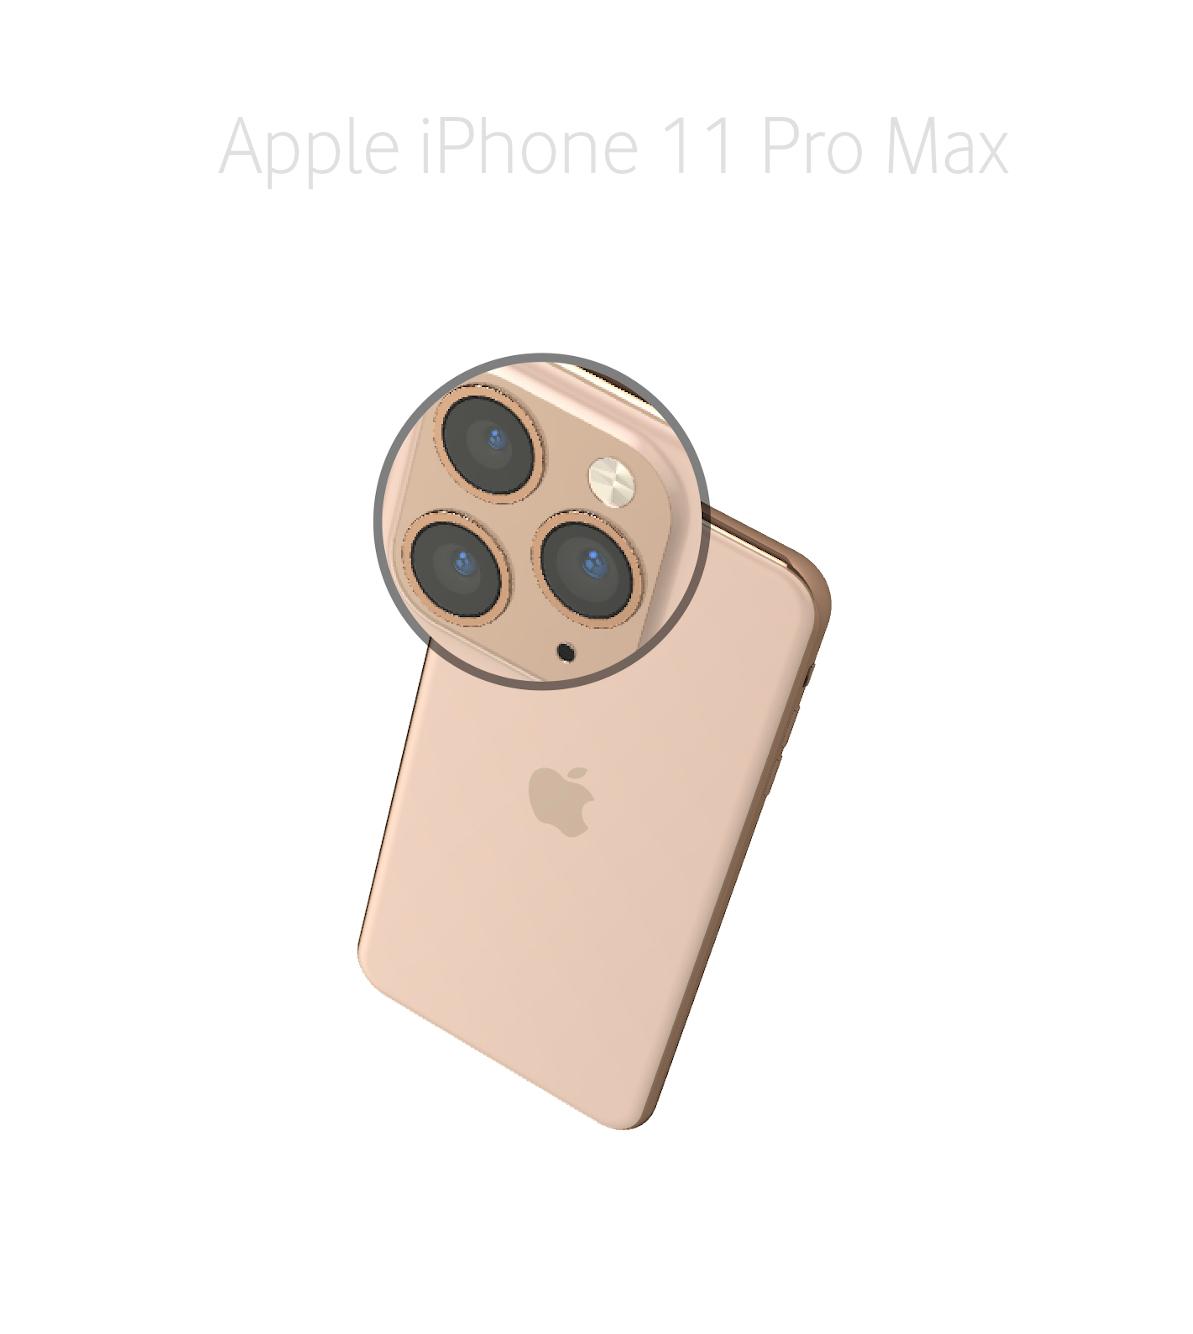 Laga kameralins iPhone 11 Pro Max